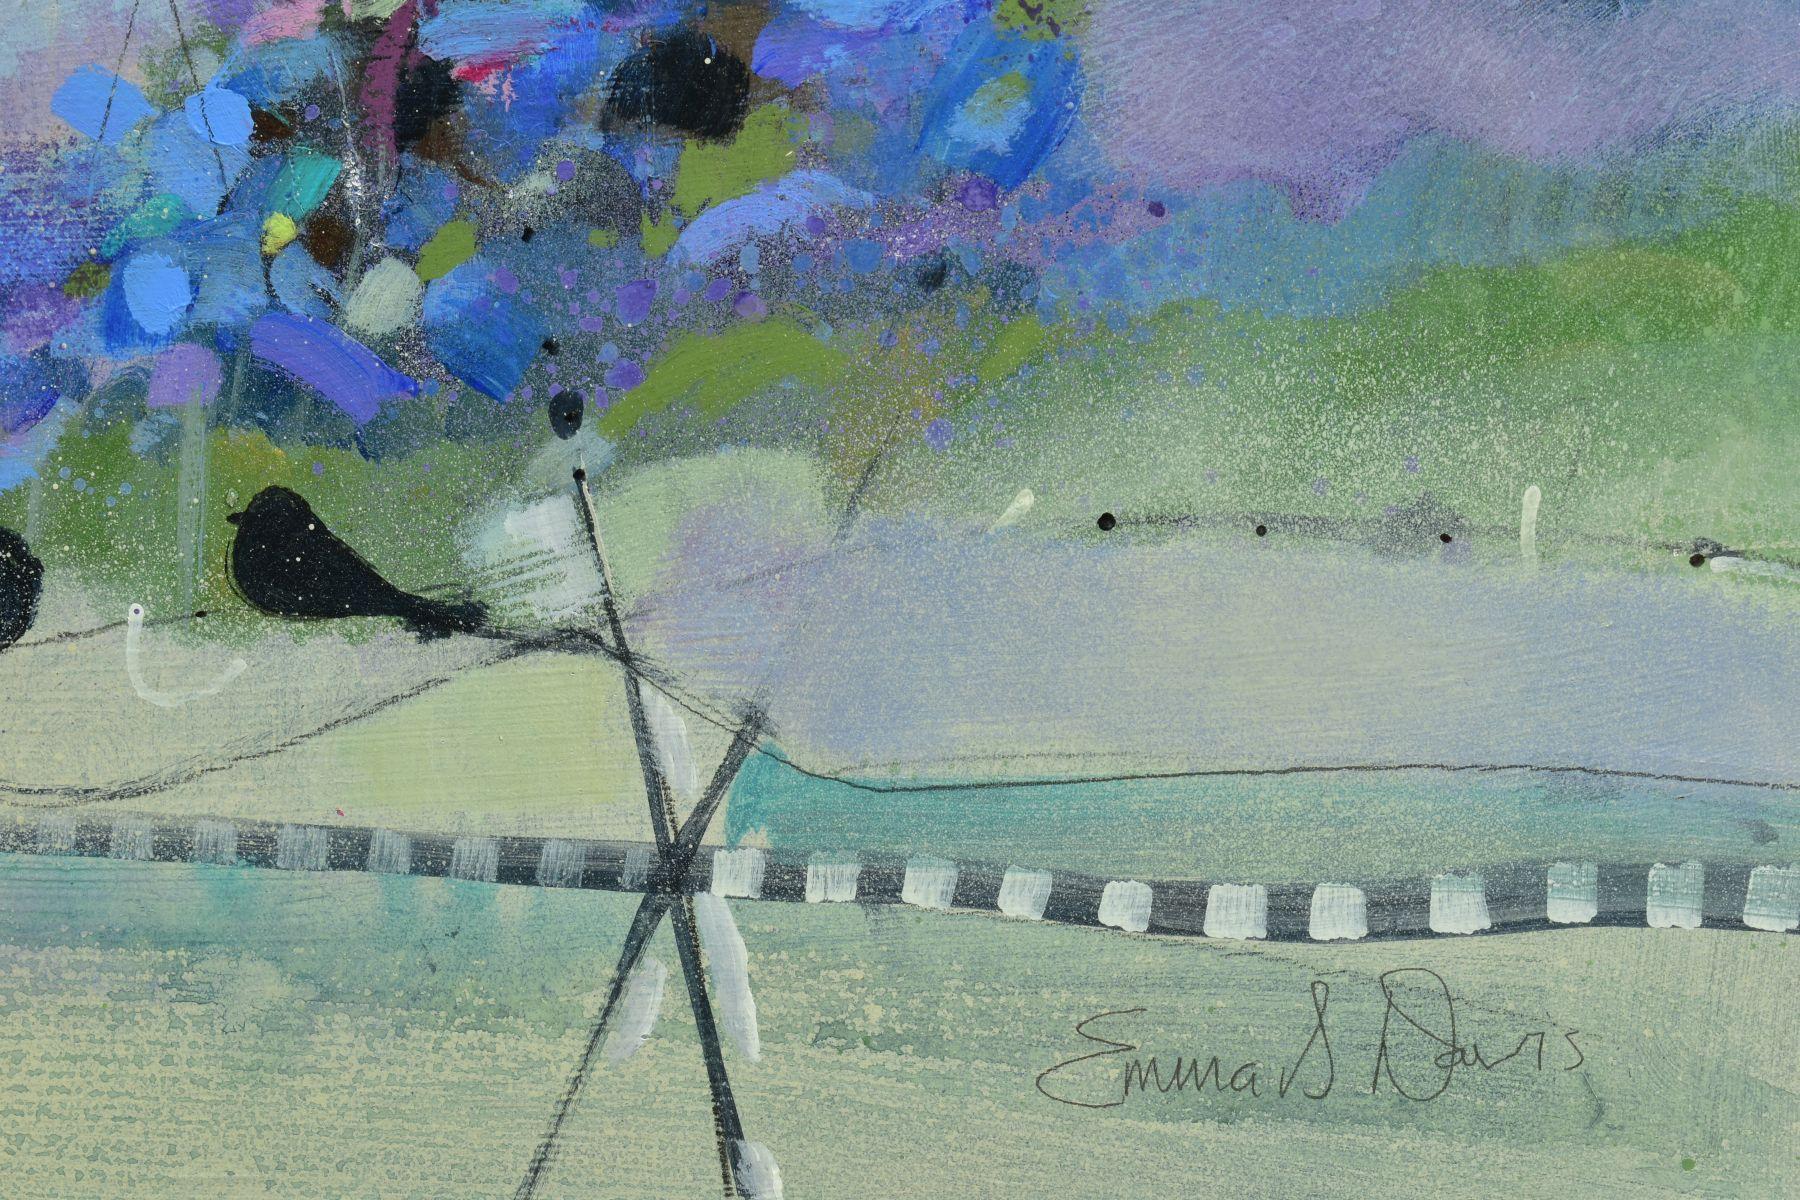 EMMA S. DAVIS (SCOTTISH 1975), 'Into The Woods', a colourful woodland landscape, signed bottom - Image 3 of 7